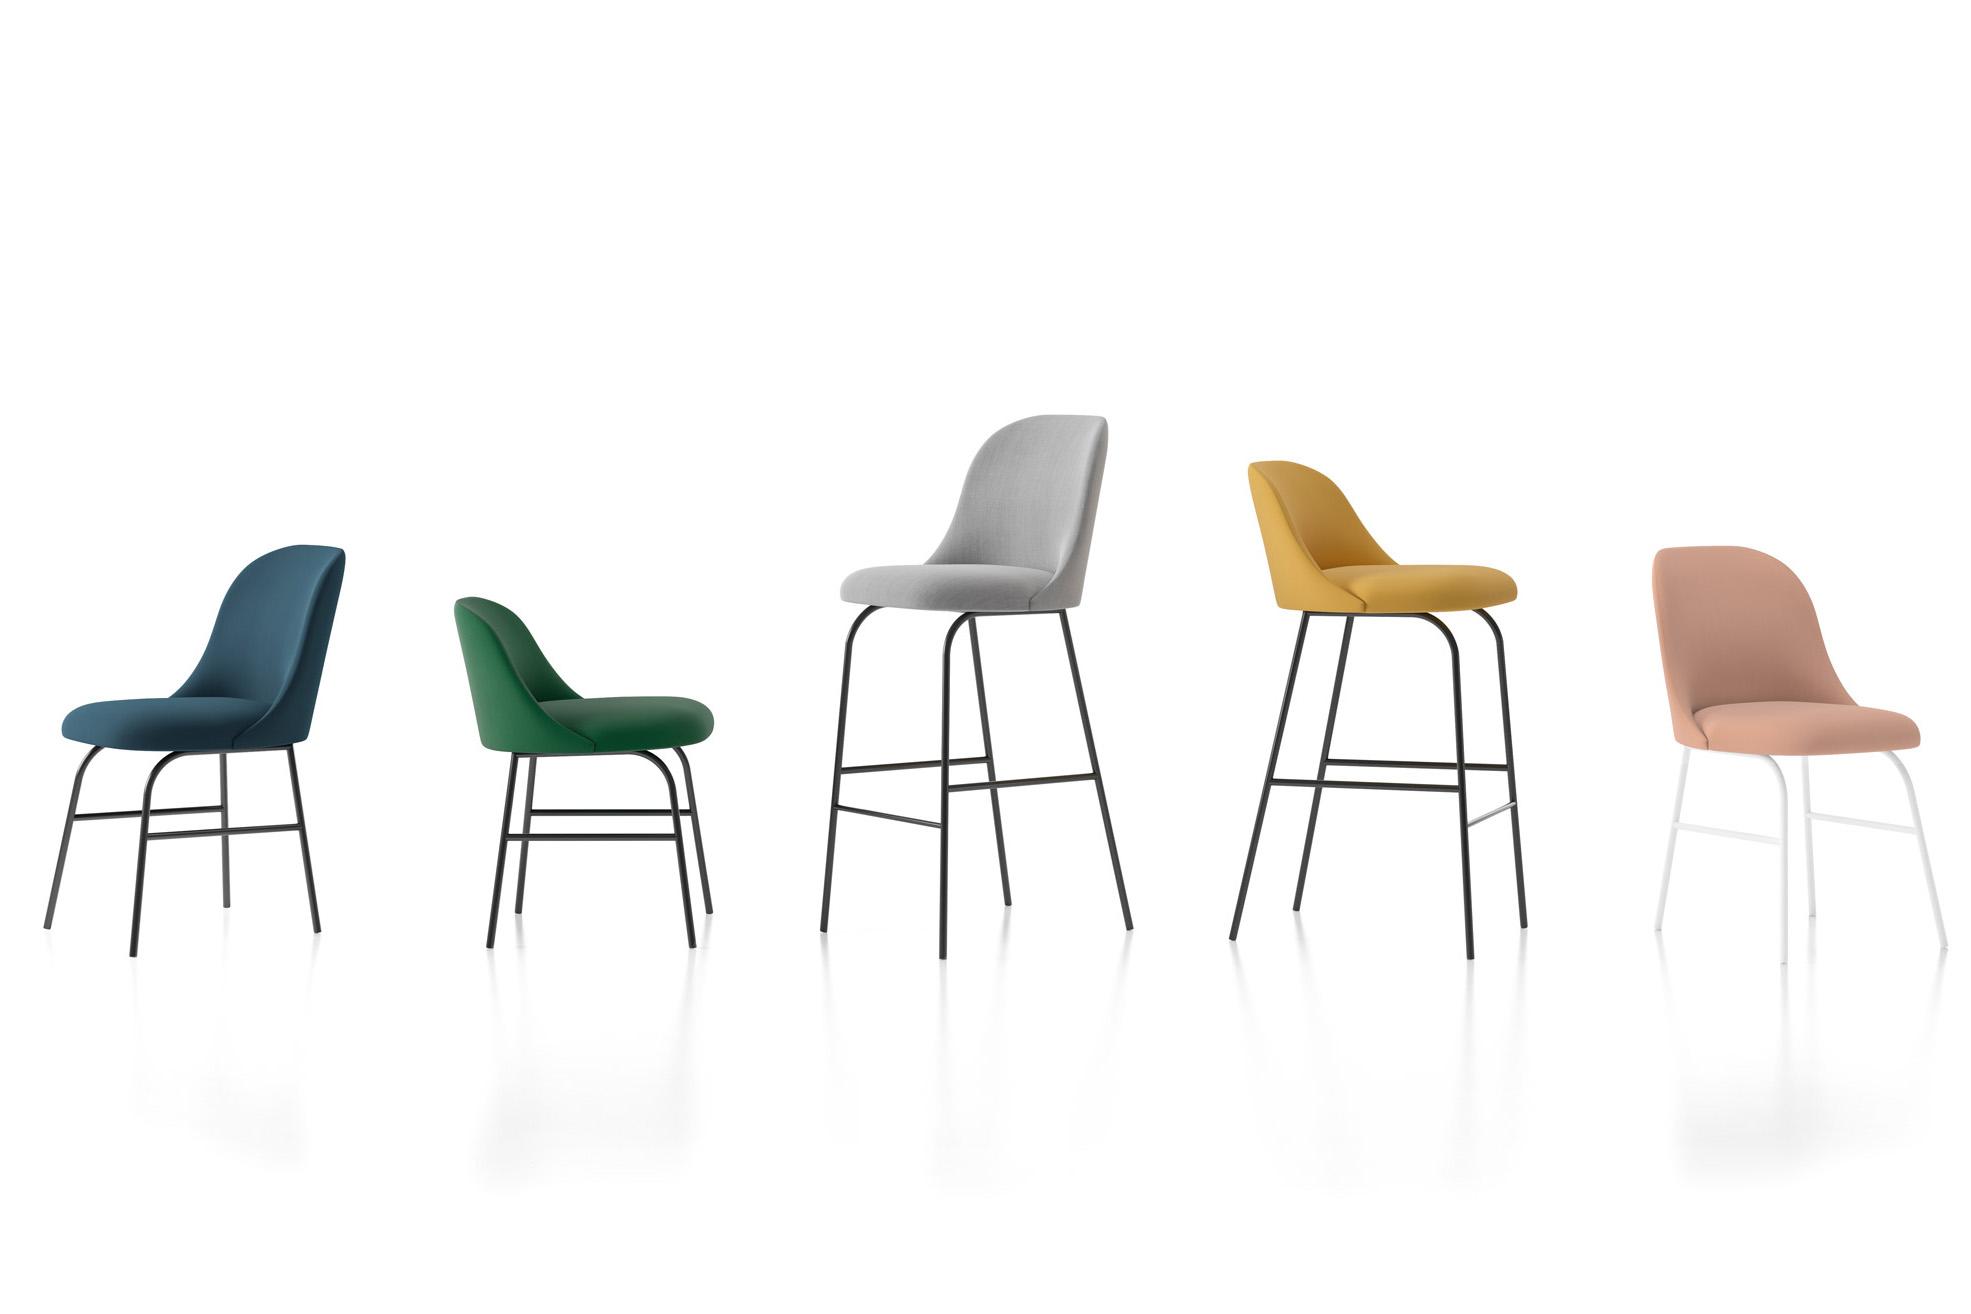 viccarbe-aleta-jaime-hayon-design-furniture-chairs-cropped_dezeen_2364_col_4.jpg